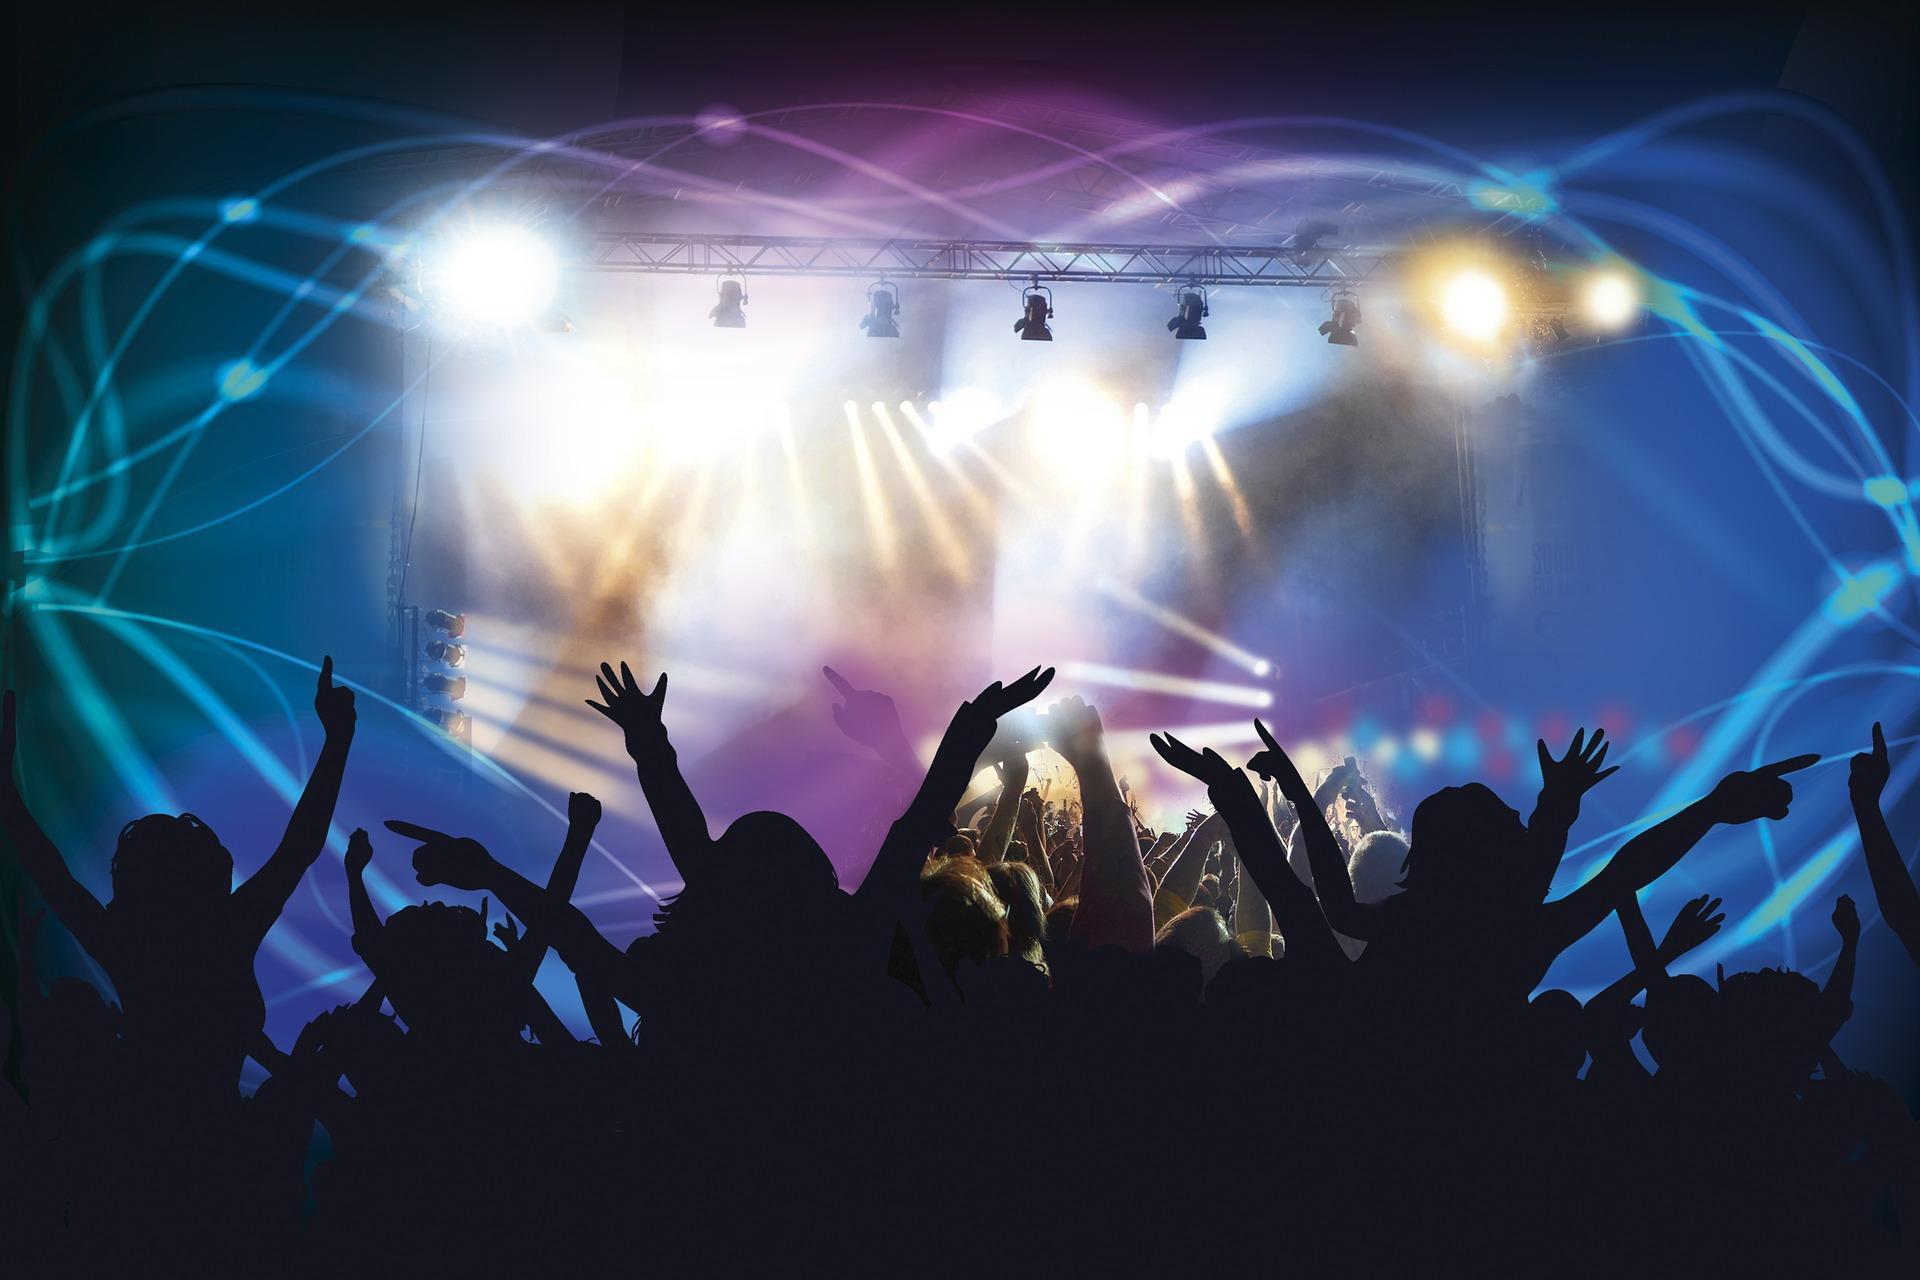 live-concert-388160_1920